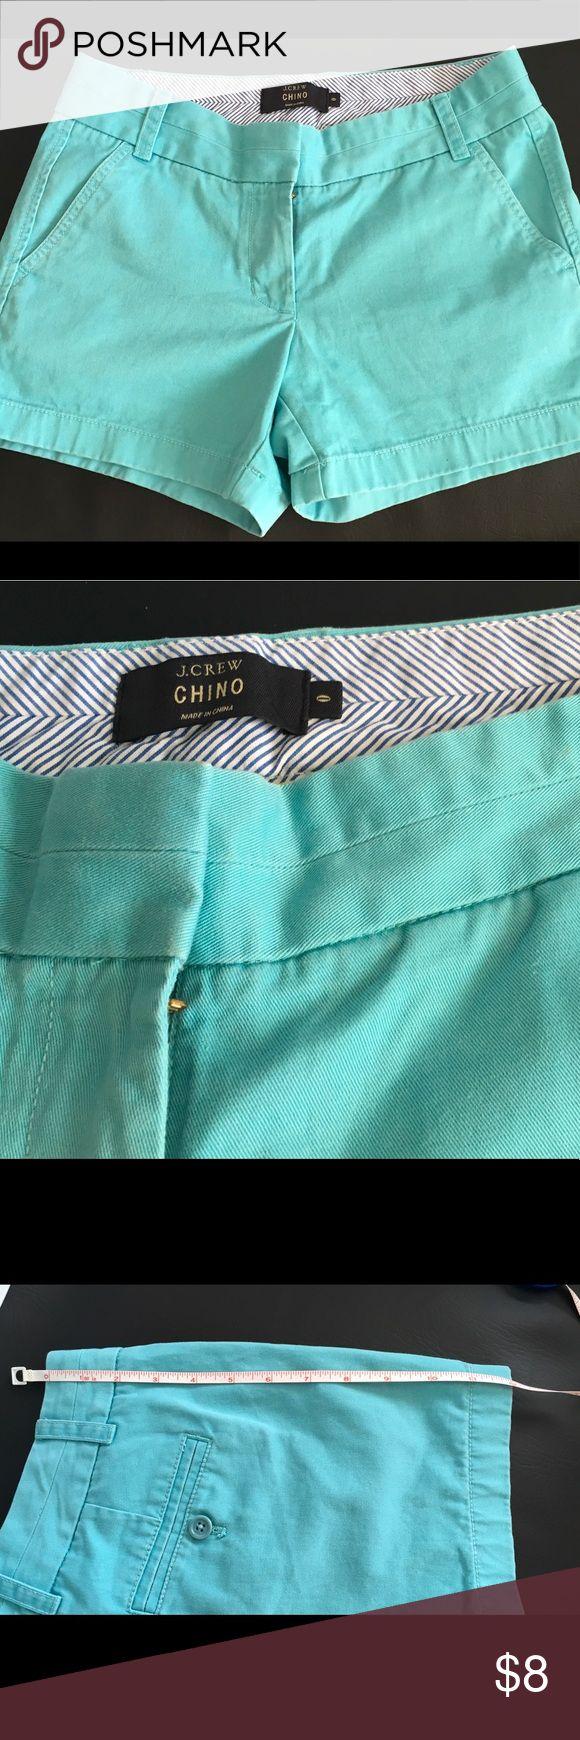 "J Crew Chino Shorts Fun Summer Mint Green size 0🏖 J Crew Chino 100% cotton size 0 Mint Green length 12"" inseam 3.5"" preowned broken in chinos slight fading Fun Summer Shorts🌴 J. Crew Shorts"